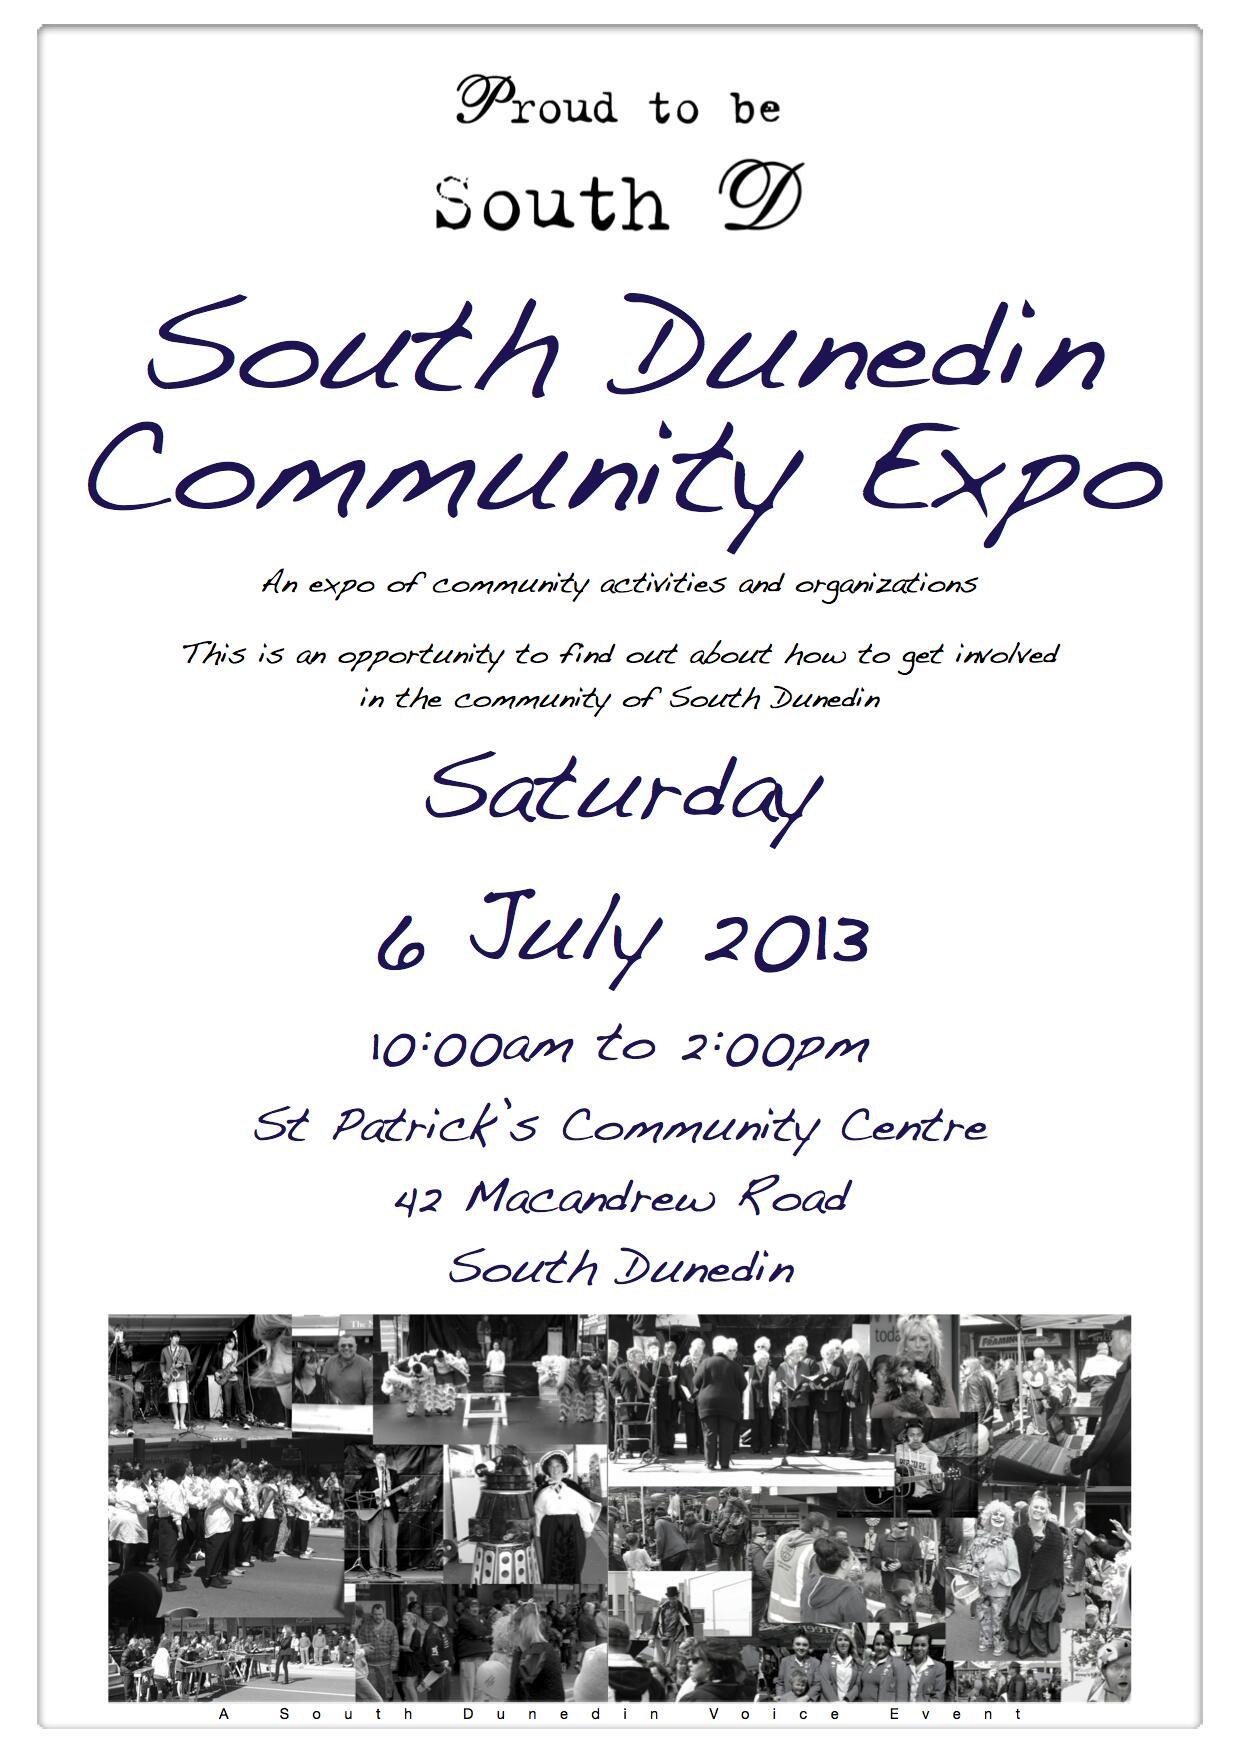 South Dunedin Community Expo